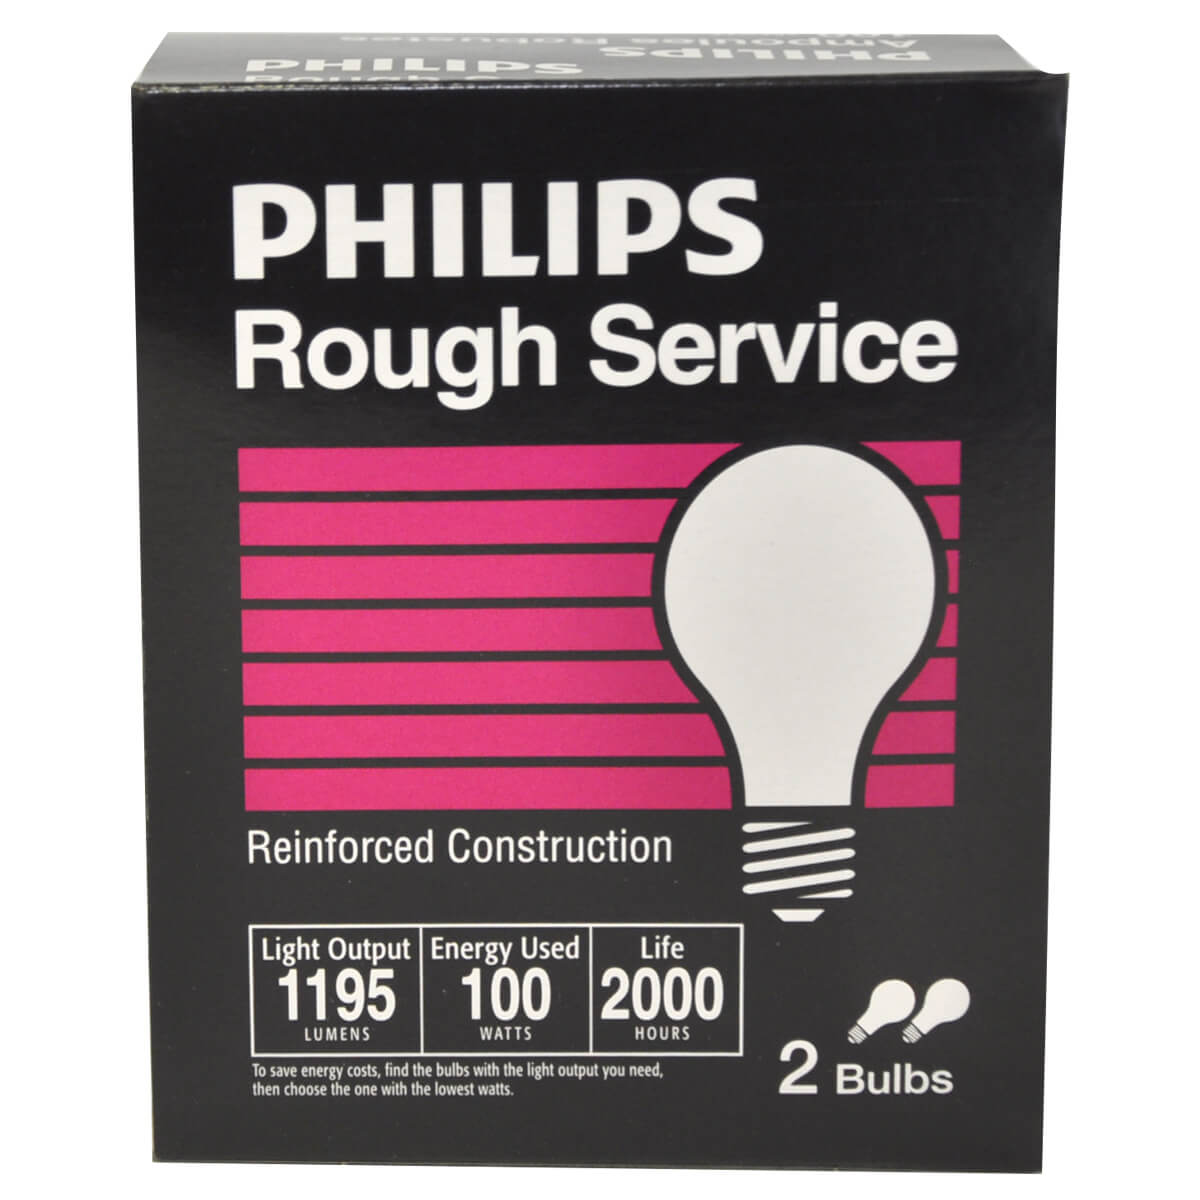 Rough Service Light Bulbs - 100W - 2 Pack